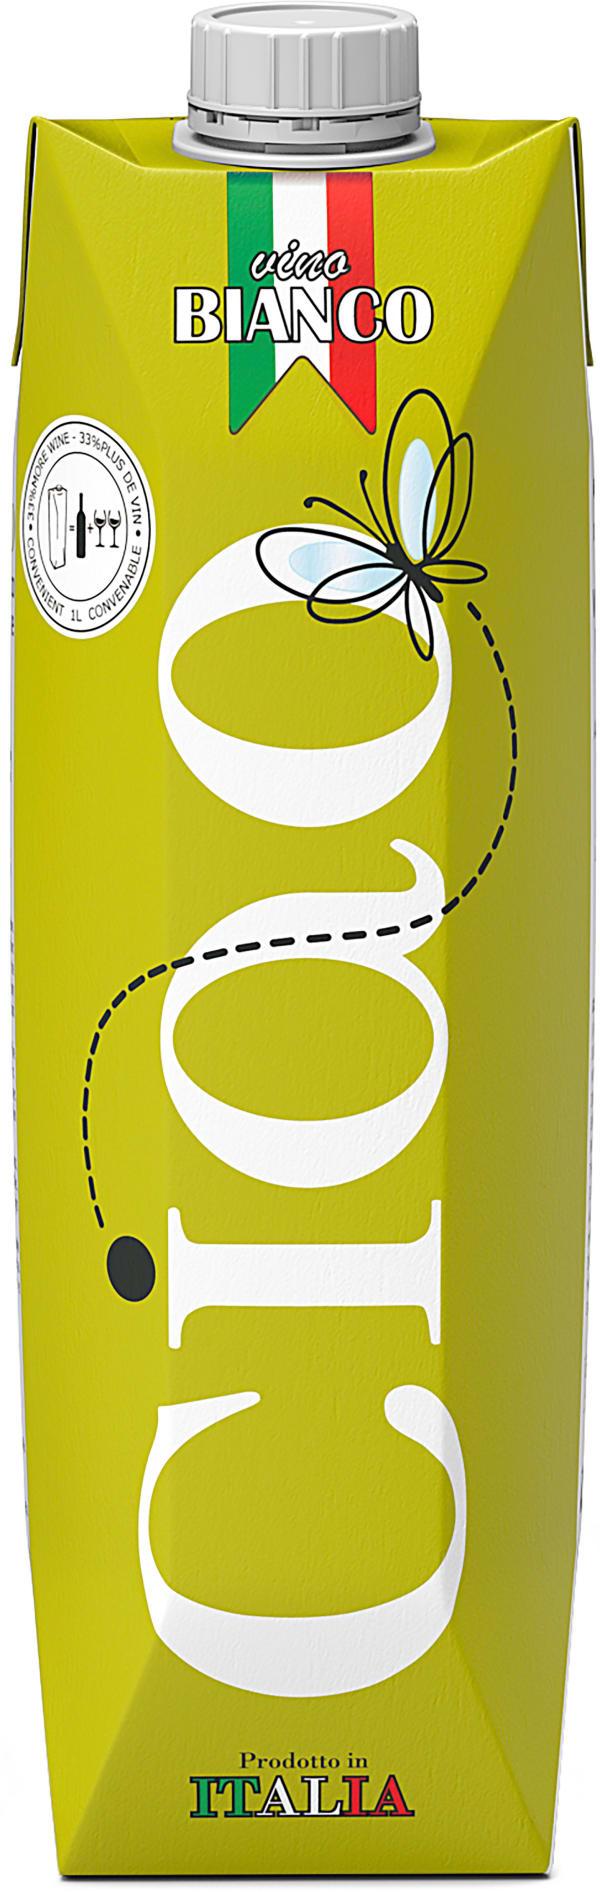 Ciao Organic Chardonnay carton package